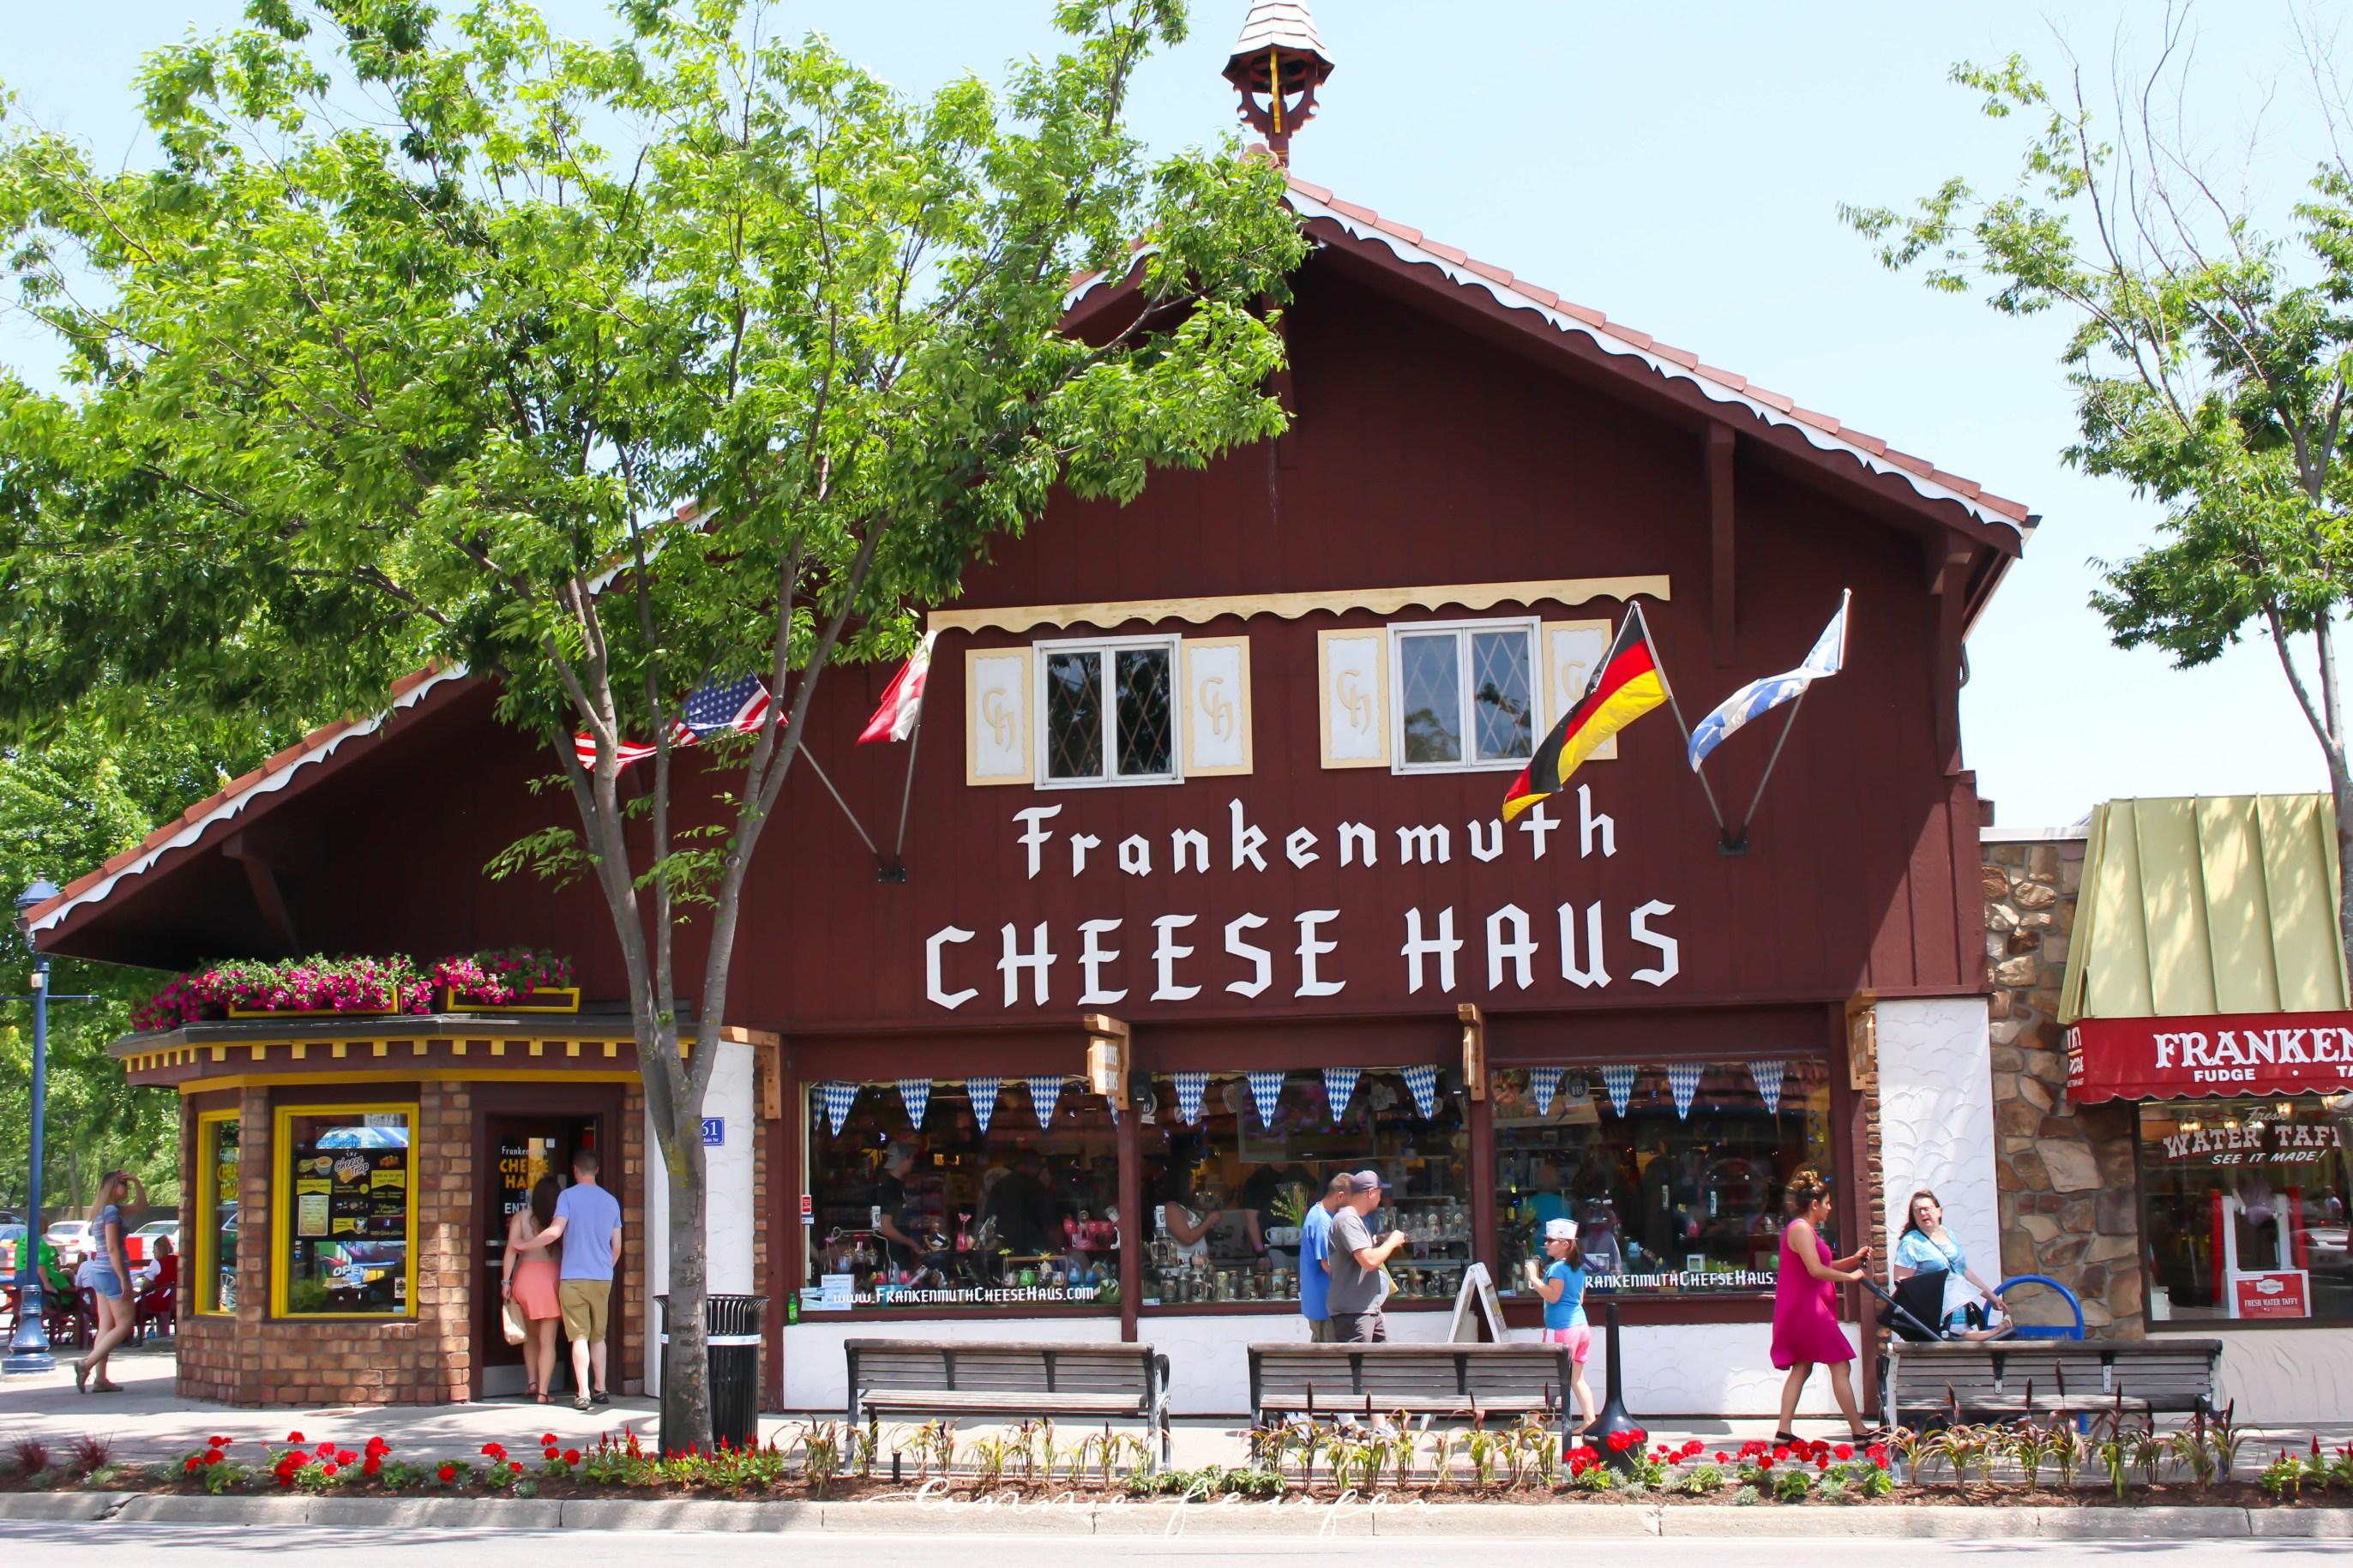 Frankenmuth Cheese House Holz Brucke Wooden Covered Bridge at Night Frankenmuth Bavarian Festival Michigan Tourism German Lederhosen Dirndl Dress